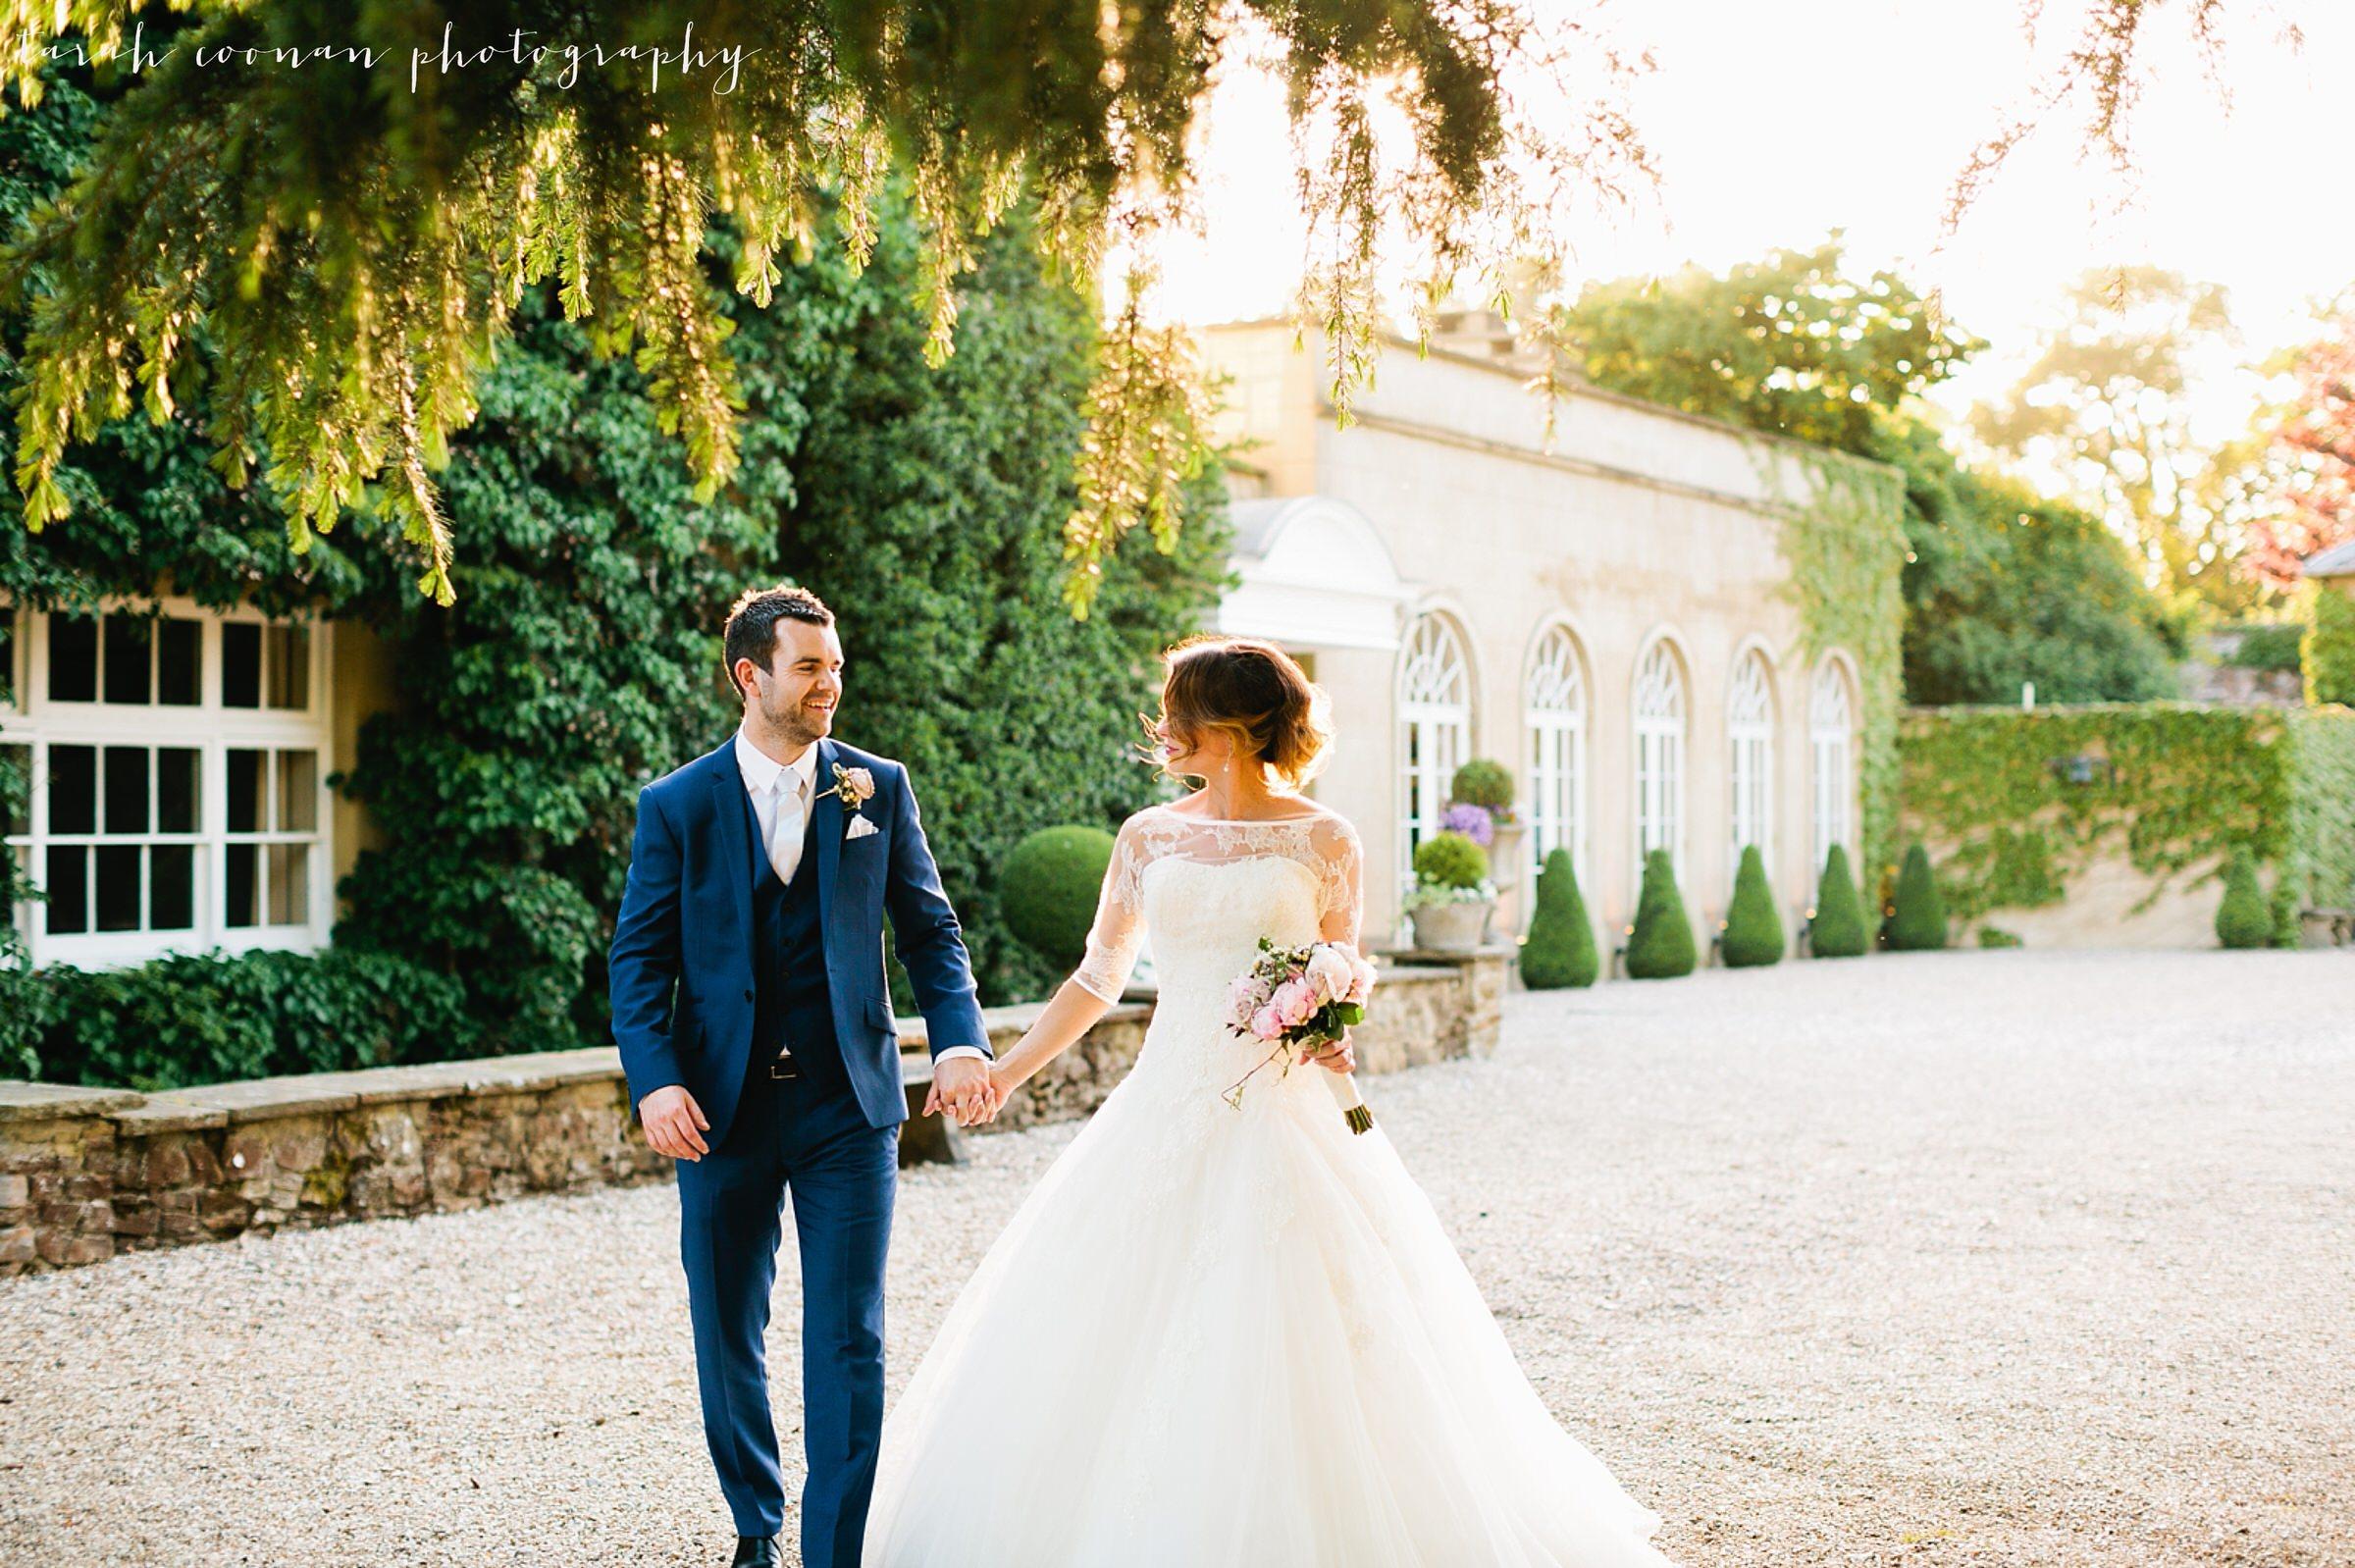 northbrook park wedding day